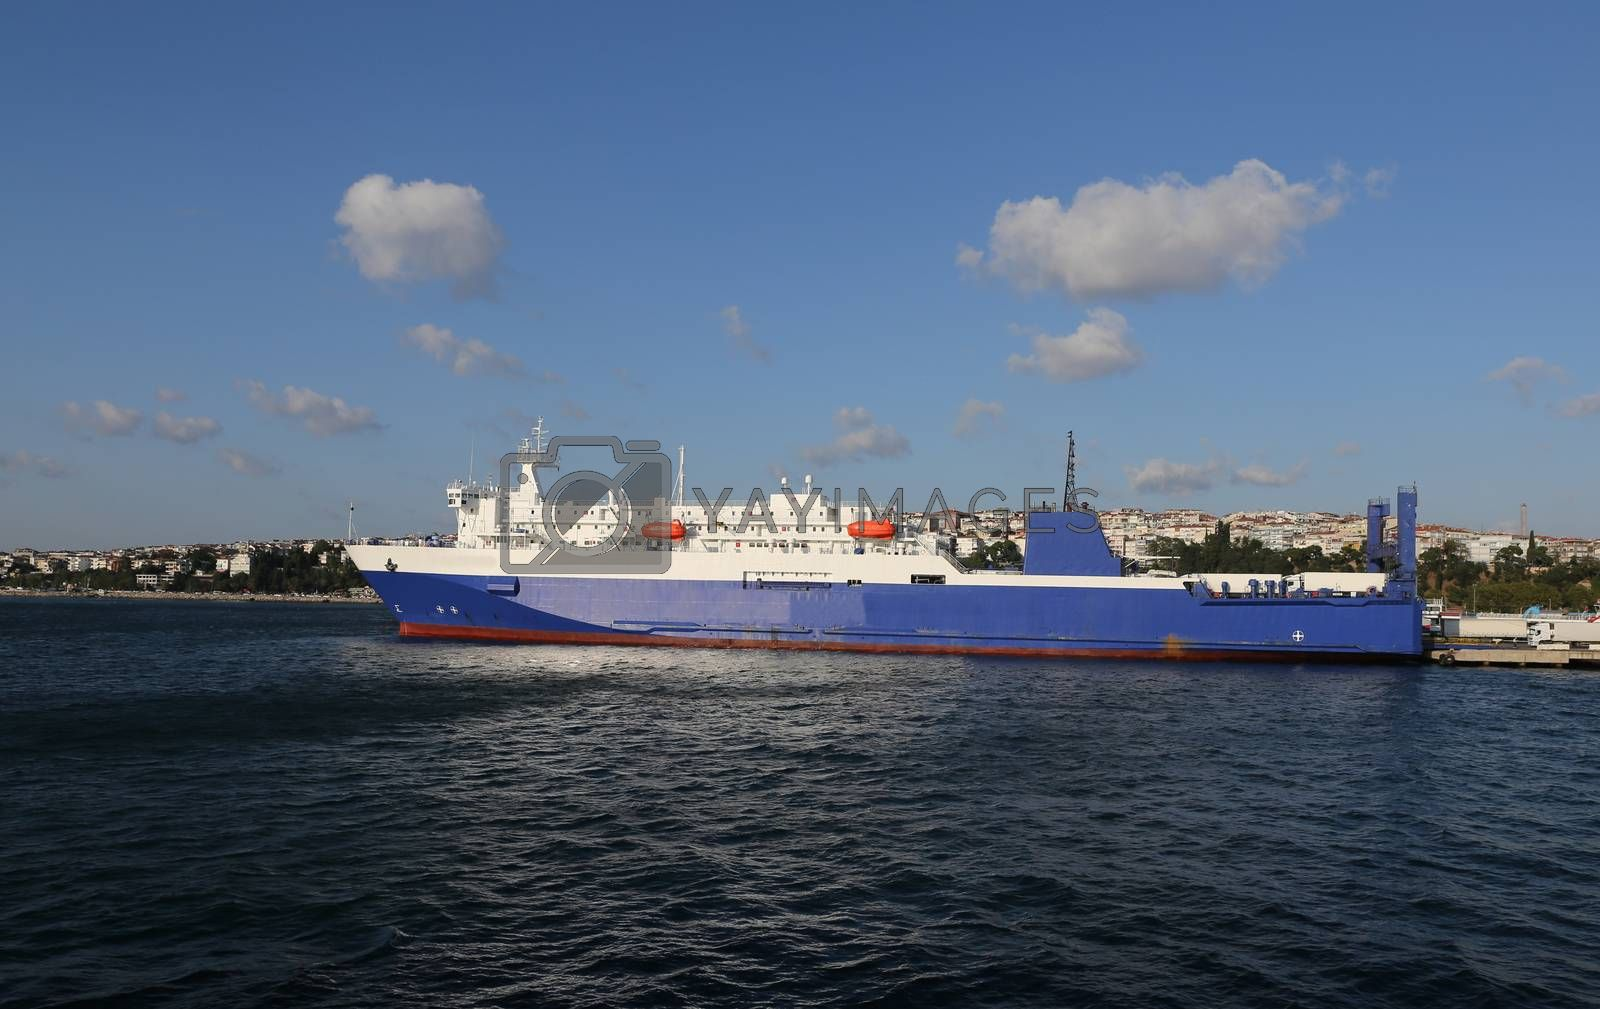 Roro Ship in Port by EvrenKalinbacak